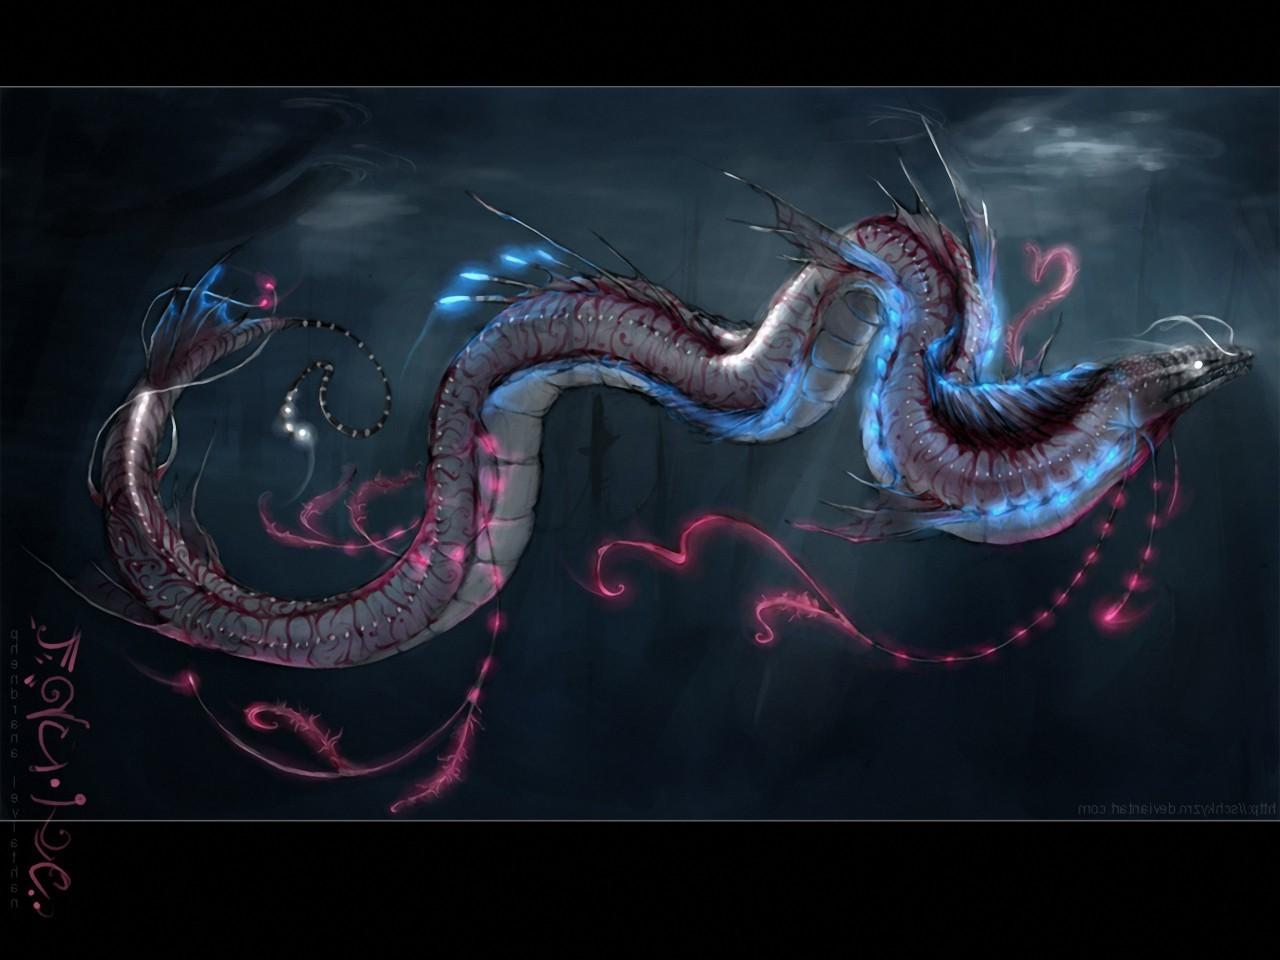 Hunter Wallpaper Hd Artwork Fantasy Art Leviathan Wallpapers Hd Desktop